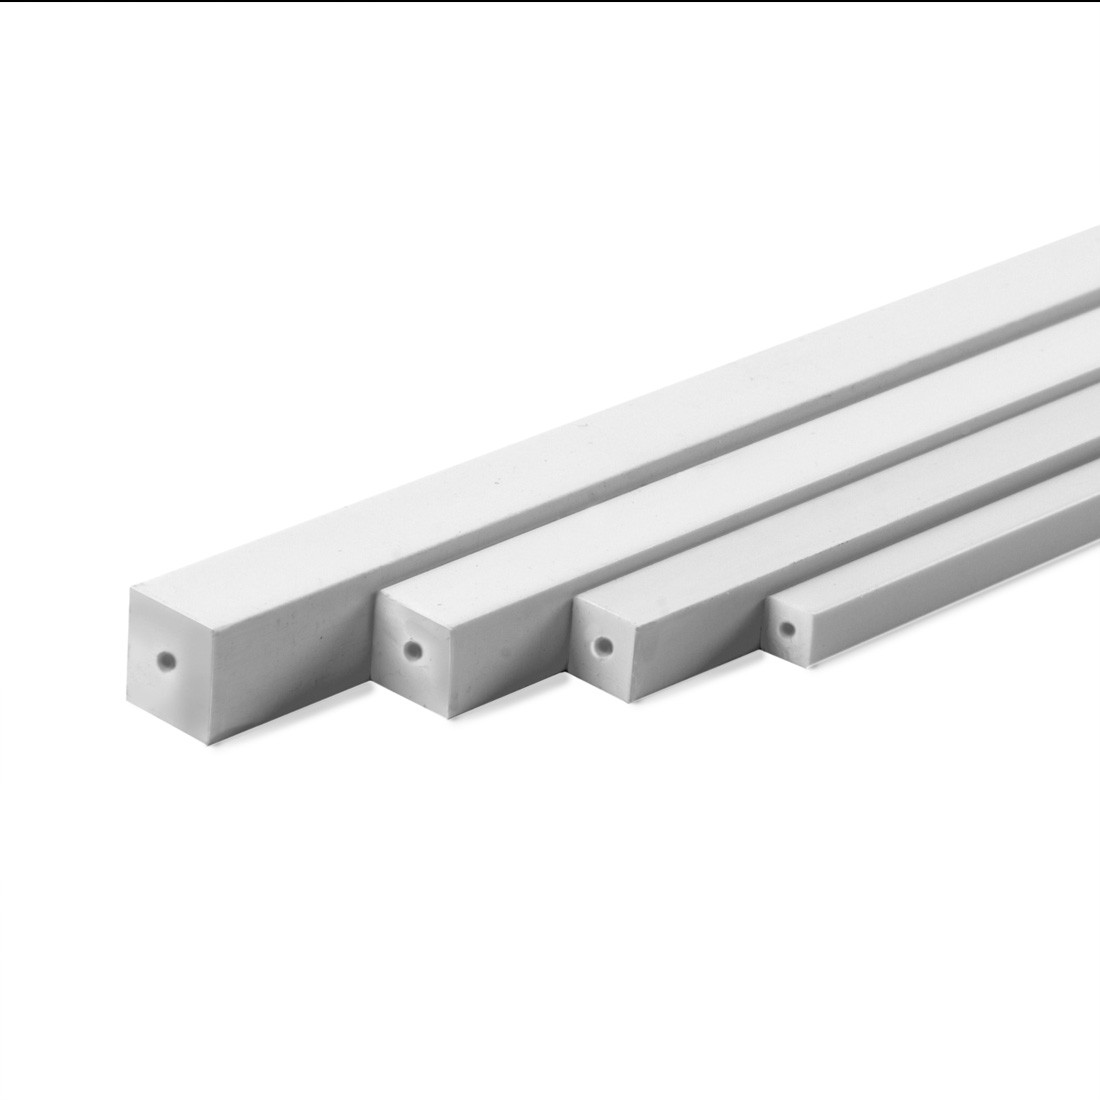 Profile ASA carré mm. 1x1000